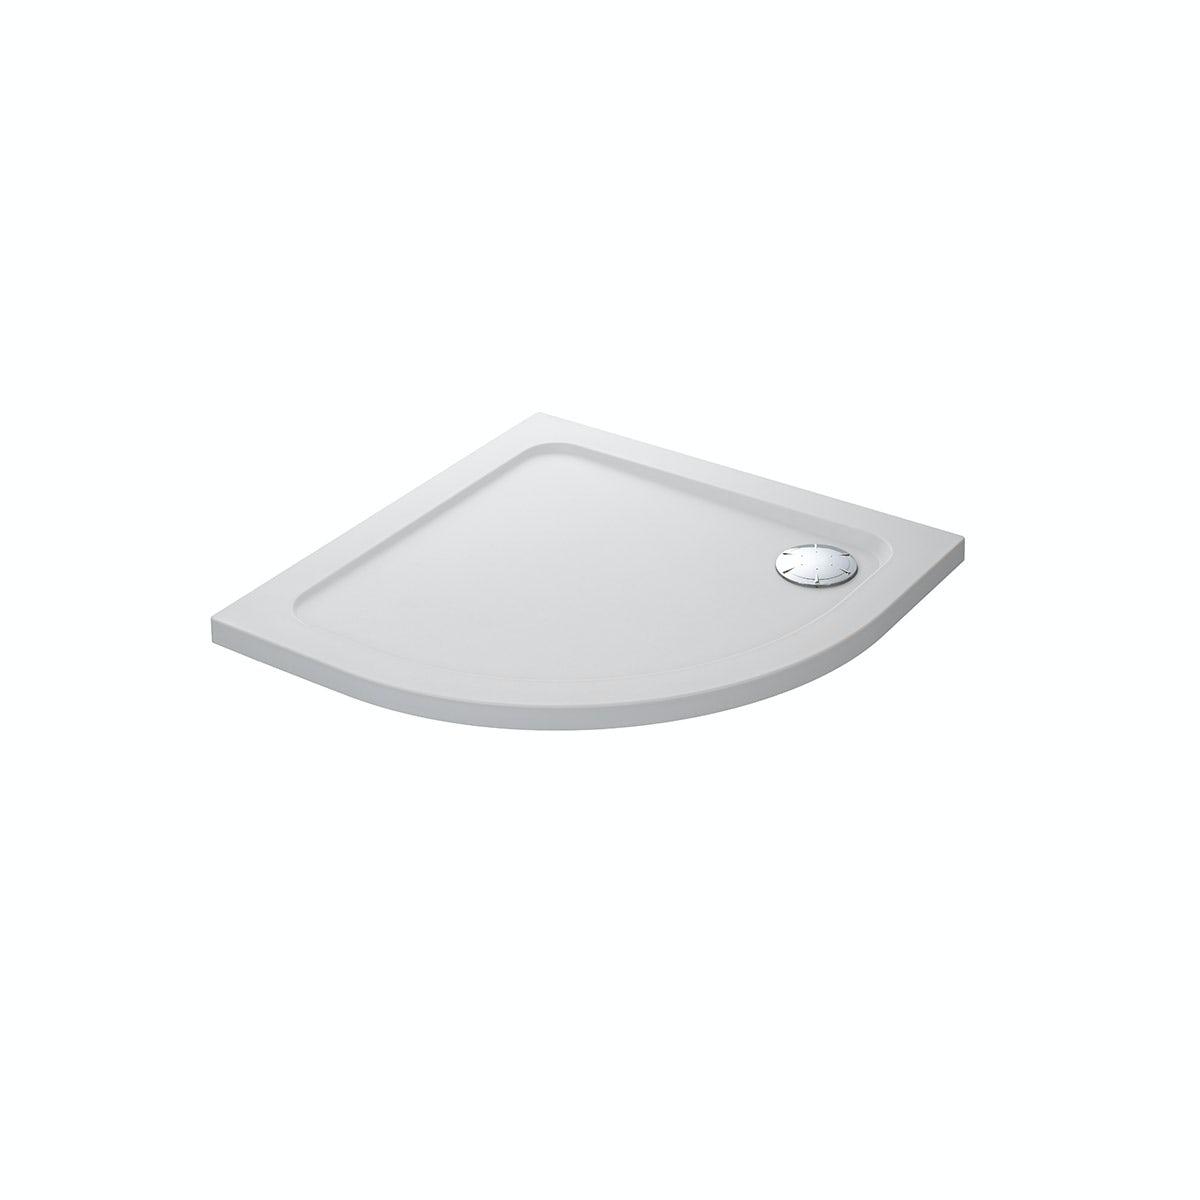 Mira Flight Safe low level anti-slip quadrant shower tray